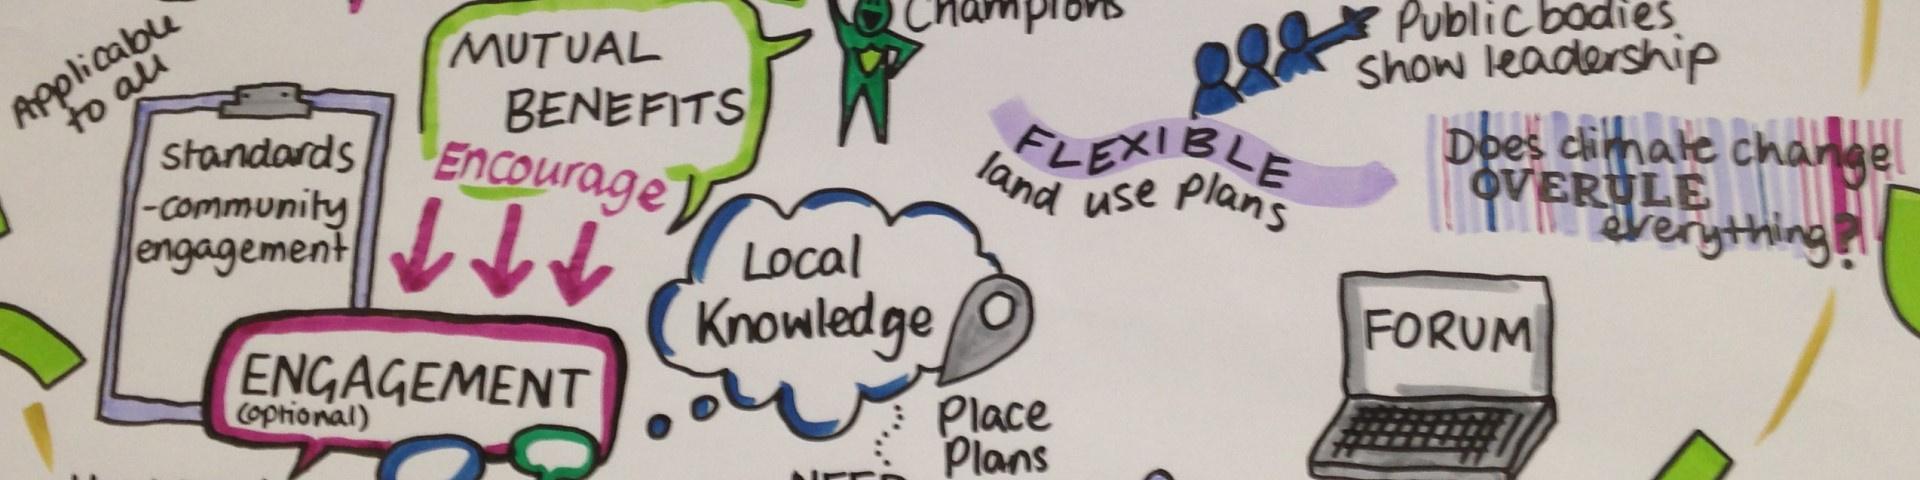 Infographic capturing community engagement ideas